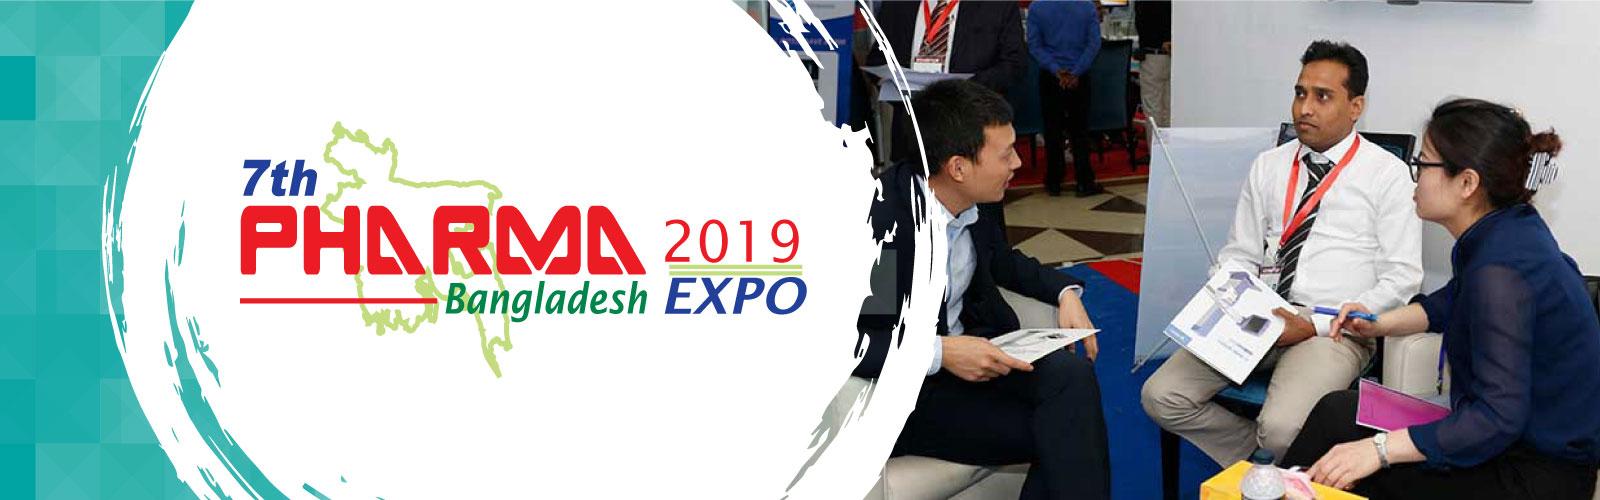 7th Pharma Bangladesh 2019 International Expo